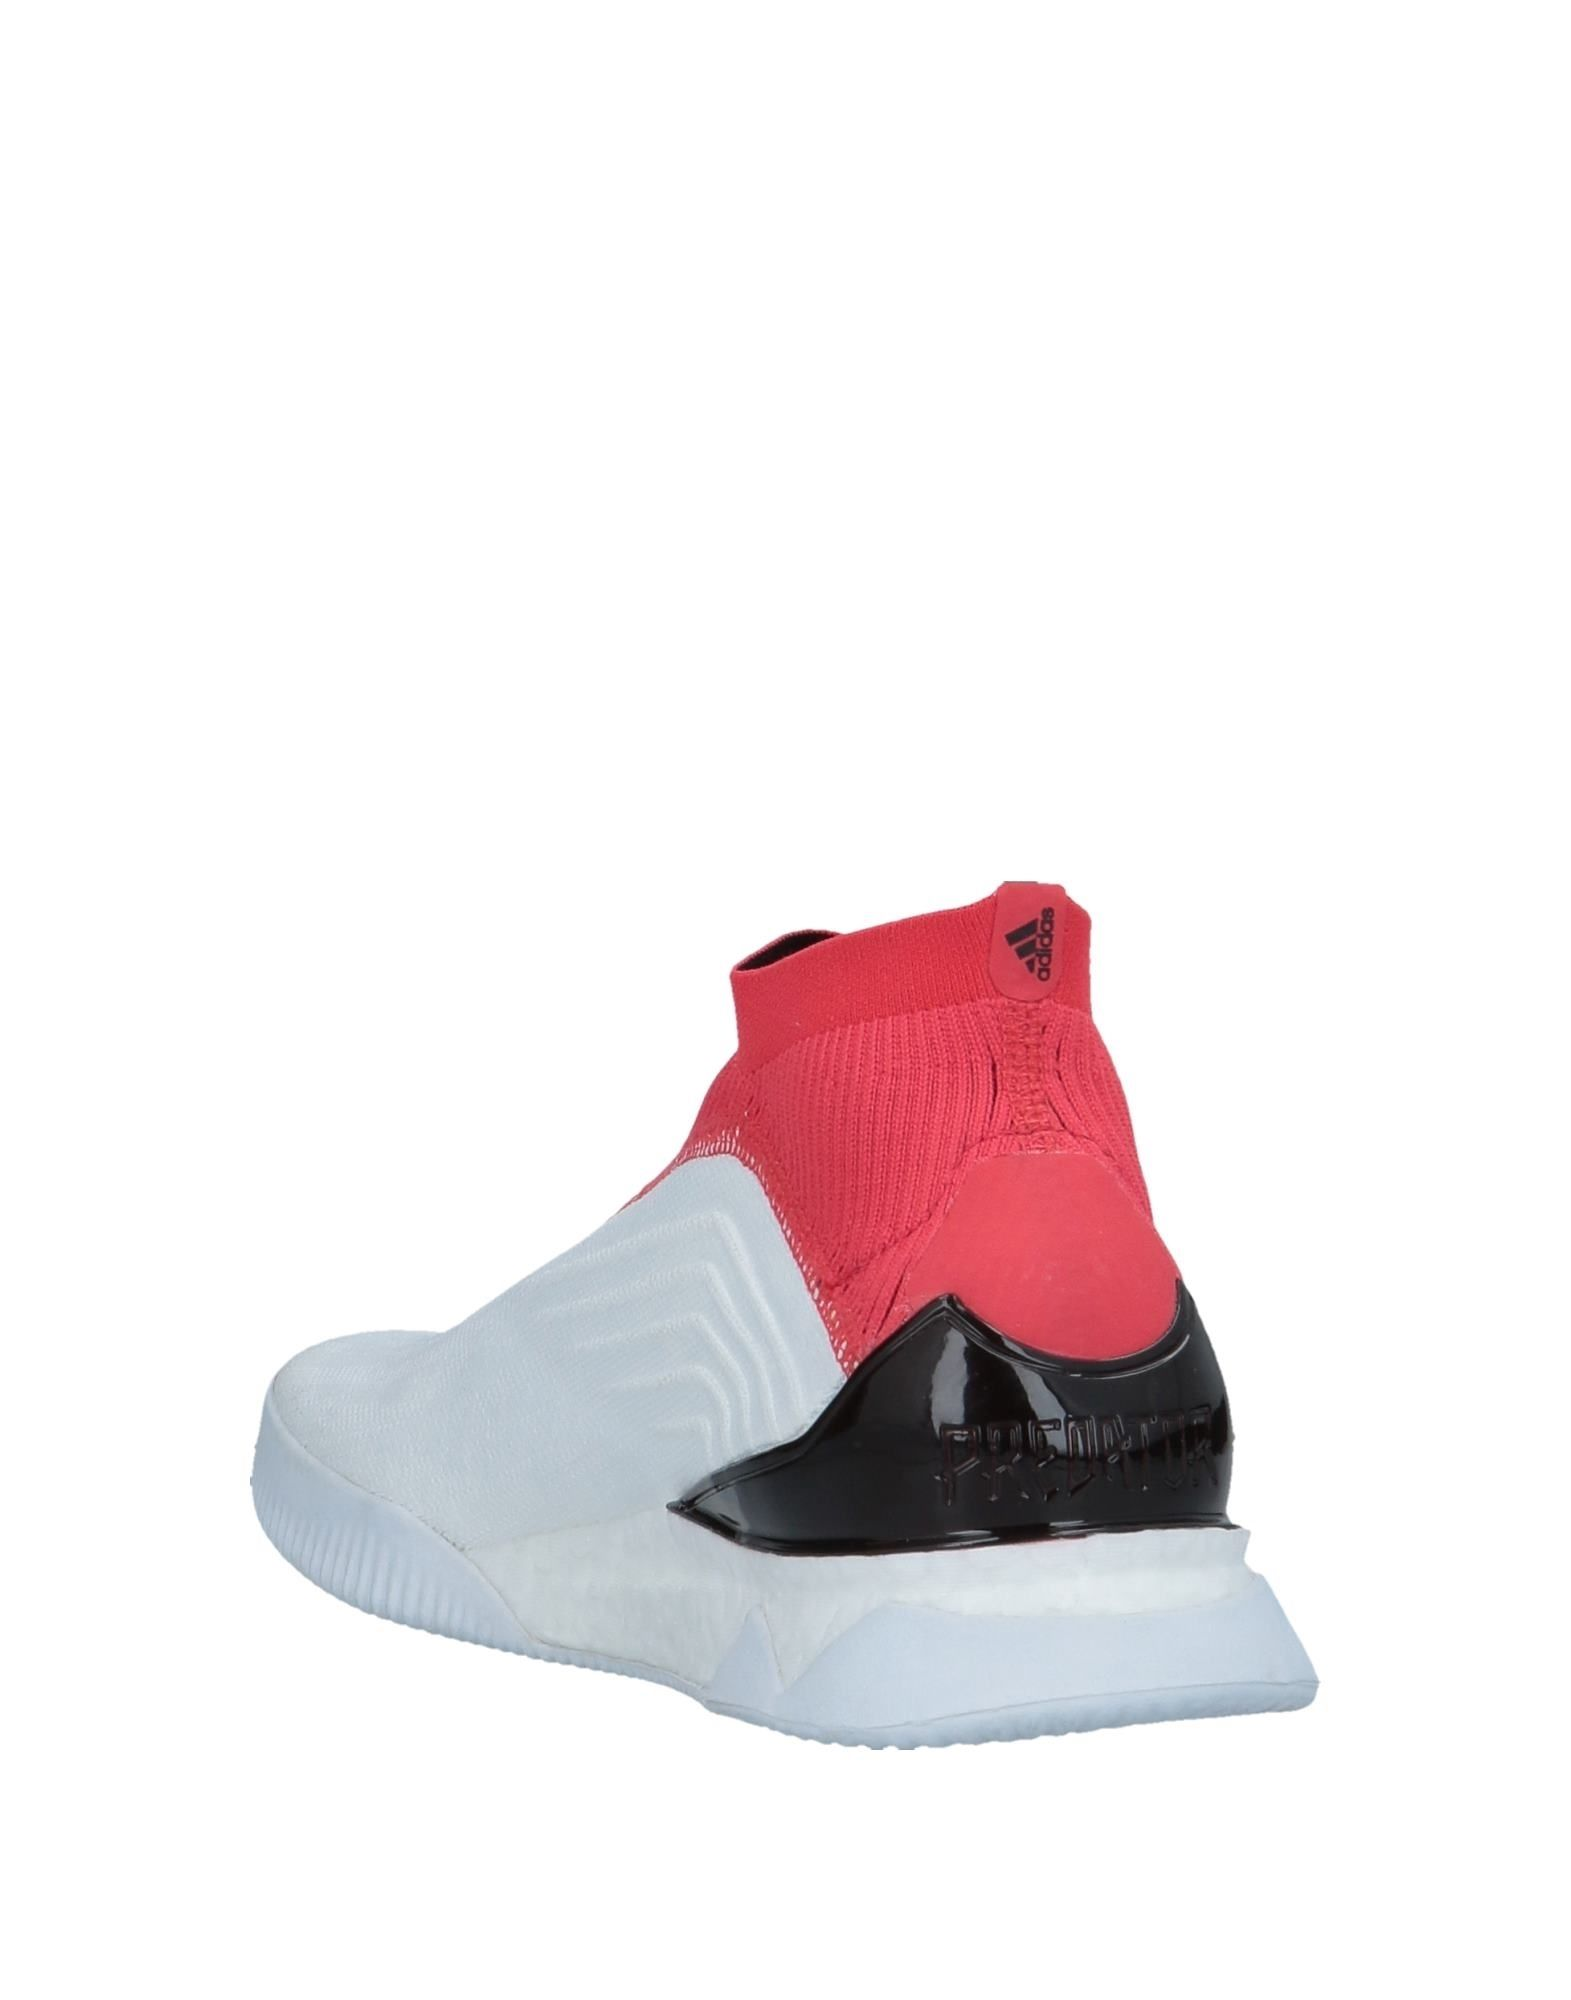 Adidas Sneakers Herren    11541971HW Gute Qualität beliebte Schuhe 0ff3f8